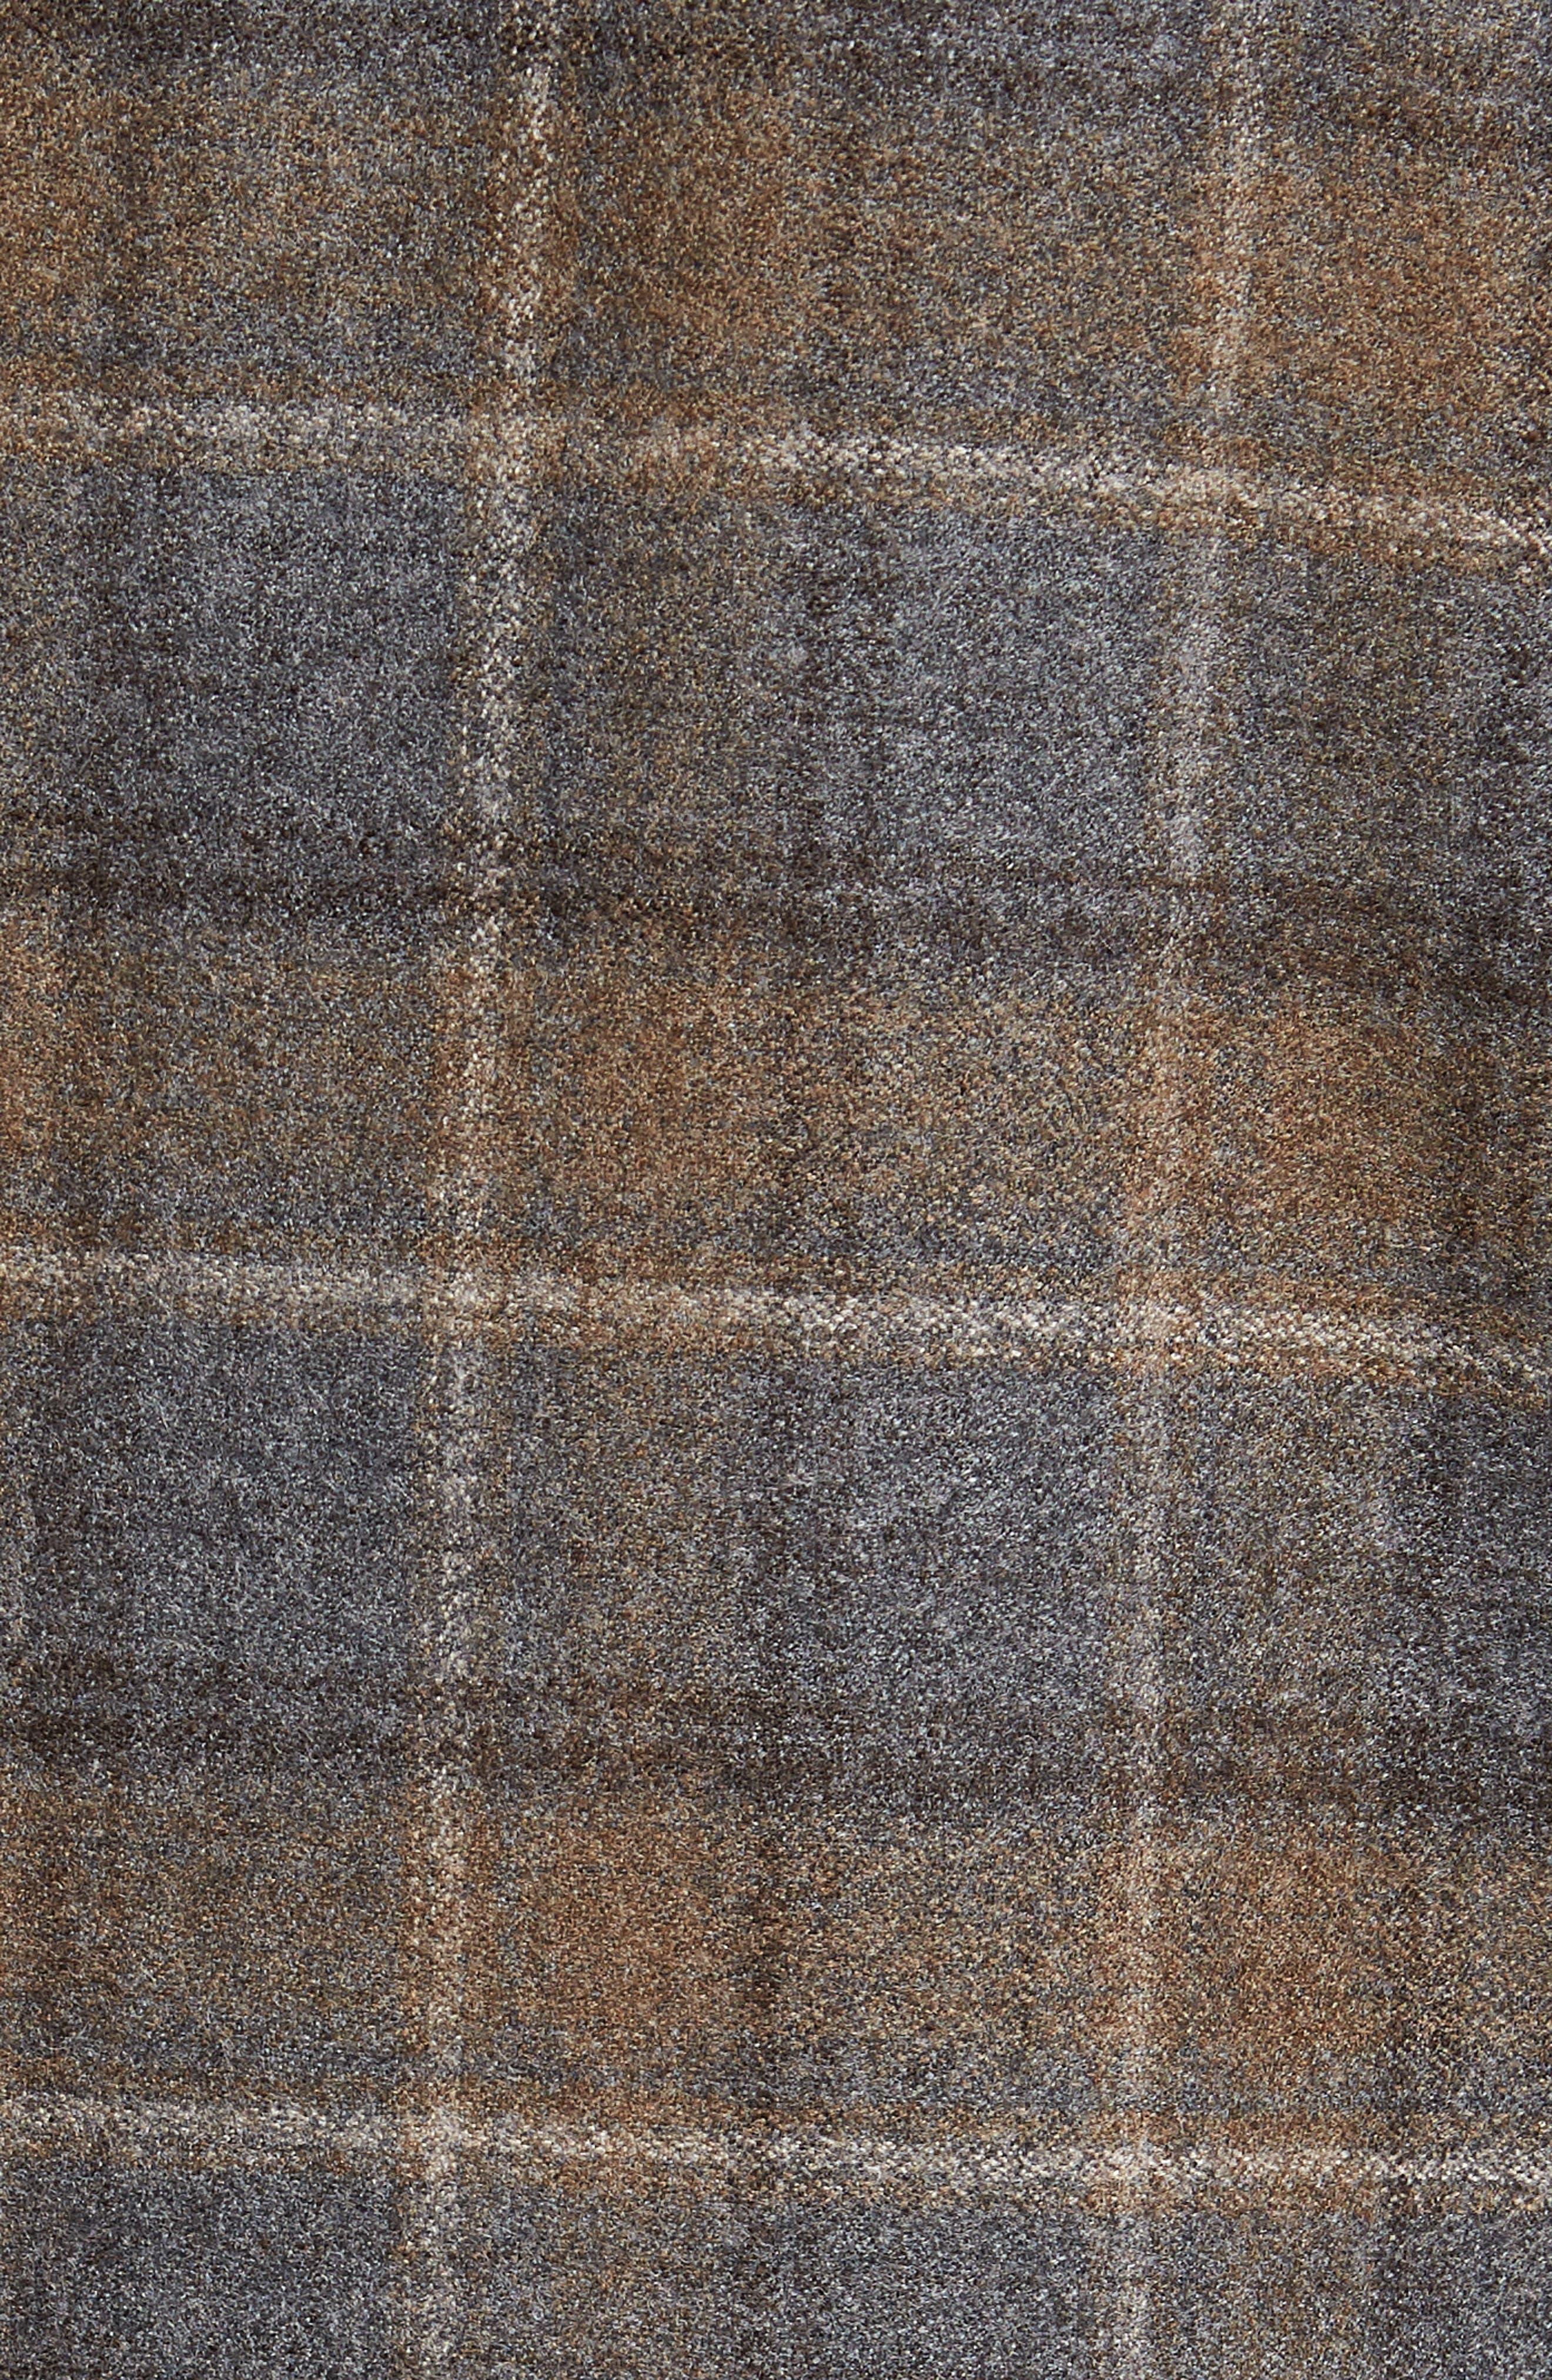 HART SCHAFFNER MARX,                             Classic Fit Plaid Wool Sport Coat,                             Alternate thumbnail 6, color,                             BROWN